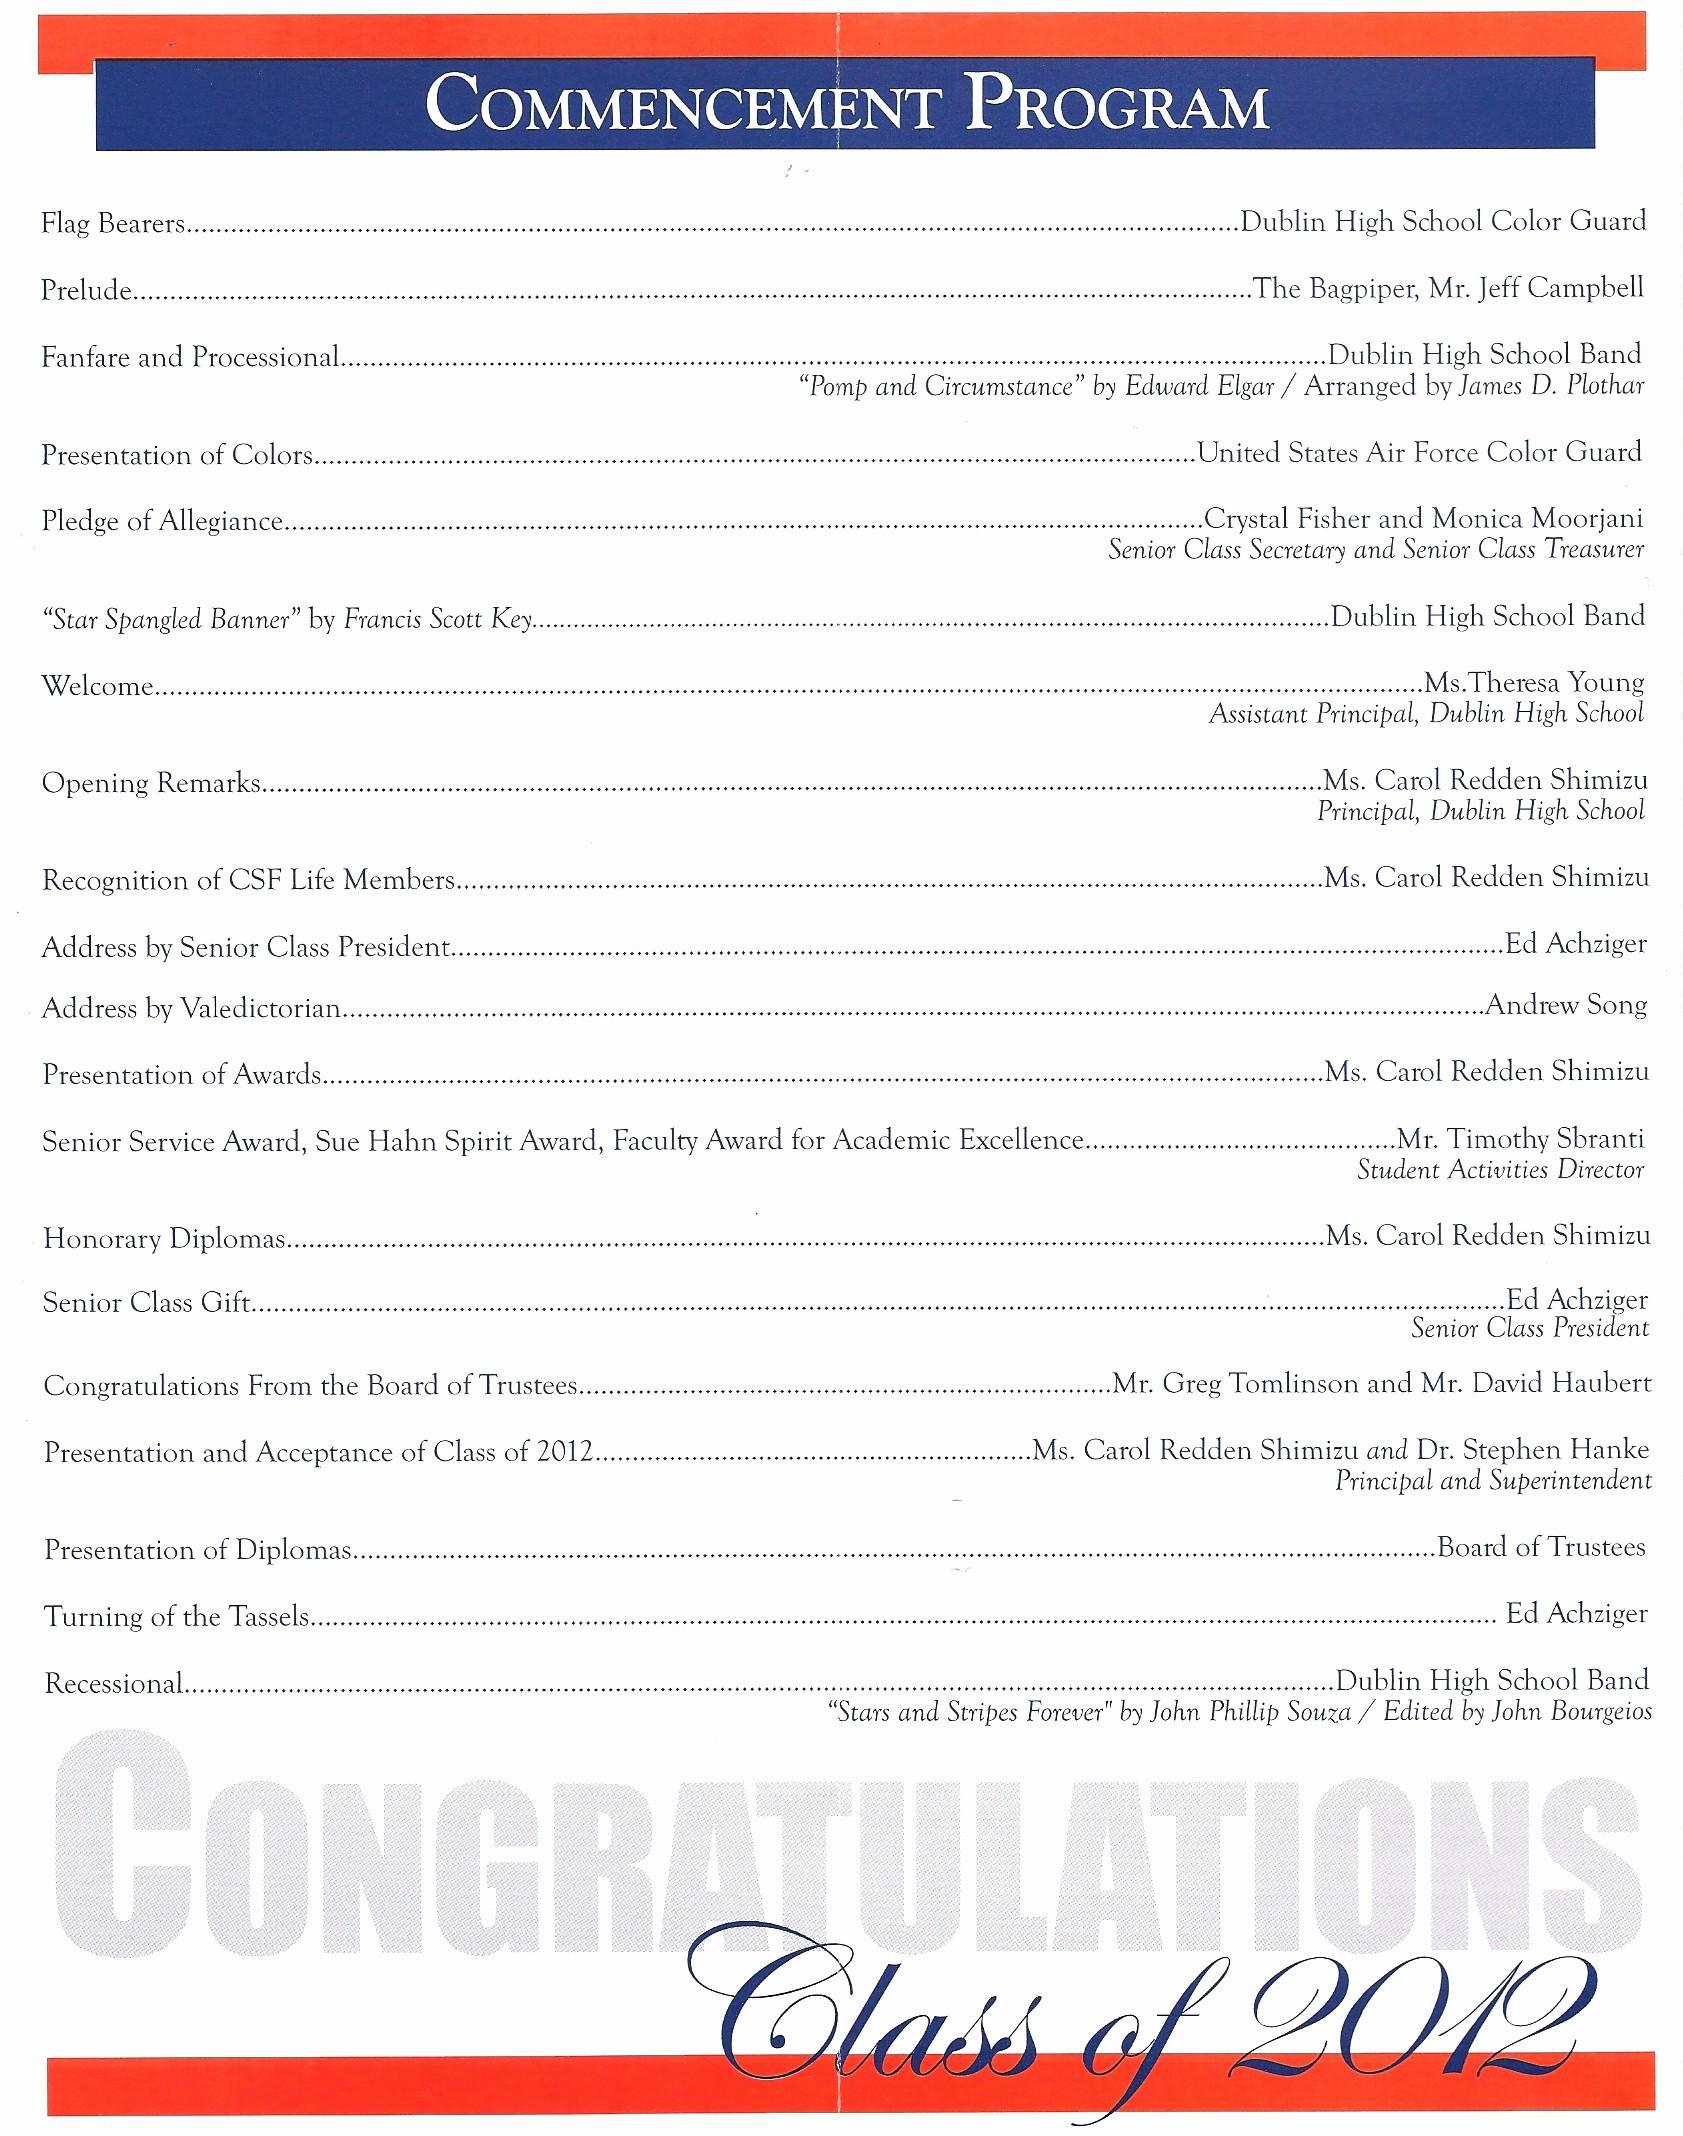 High School Graduation Program Template Awesome High School Graduation Ceremony Program Meganphoto